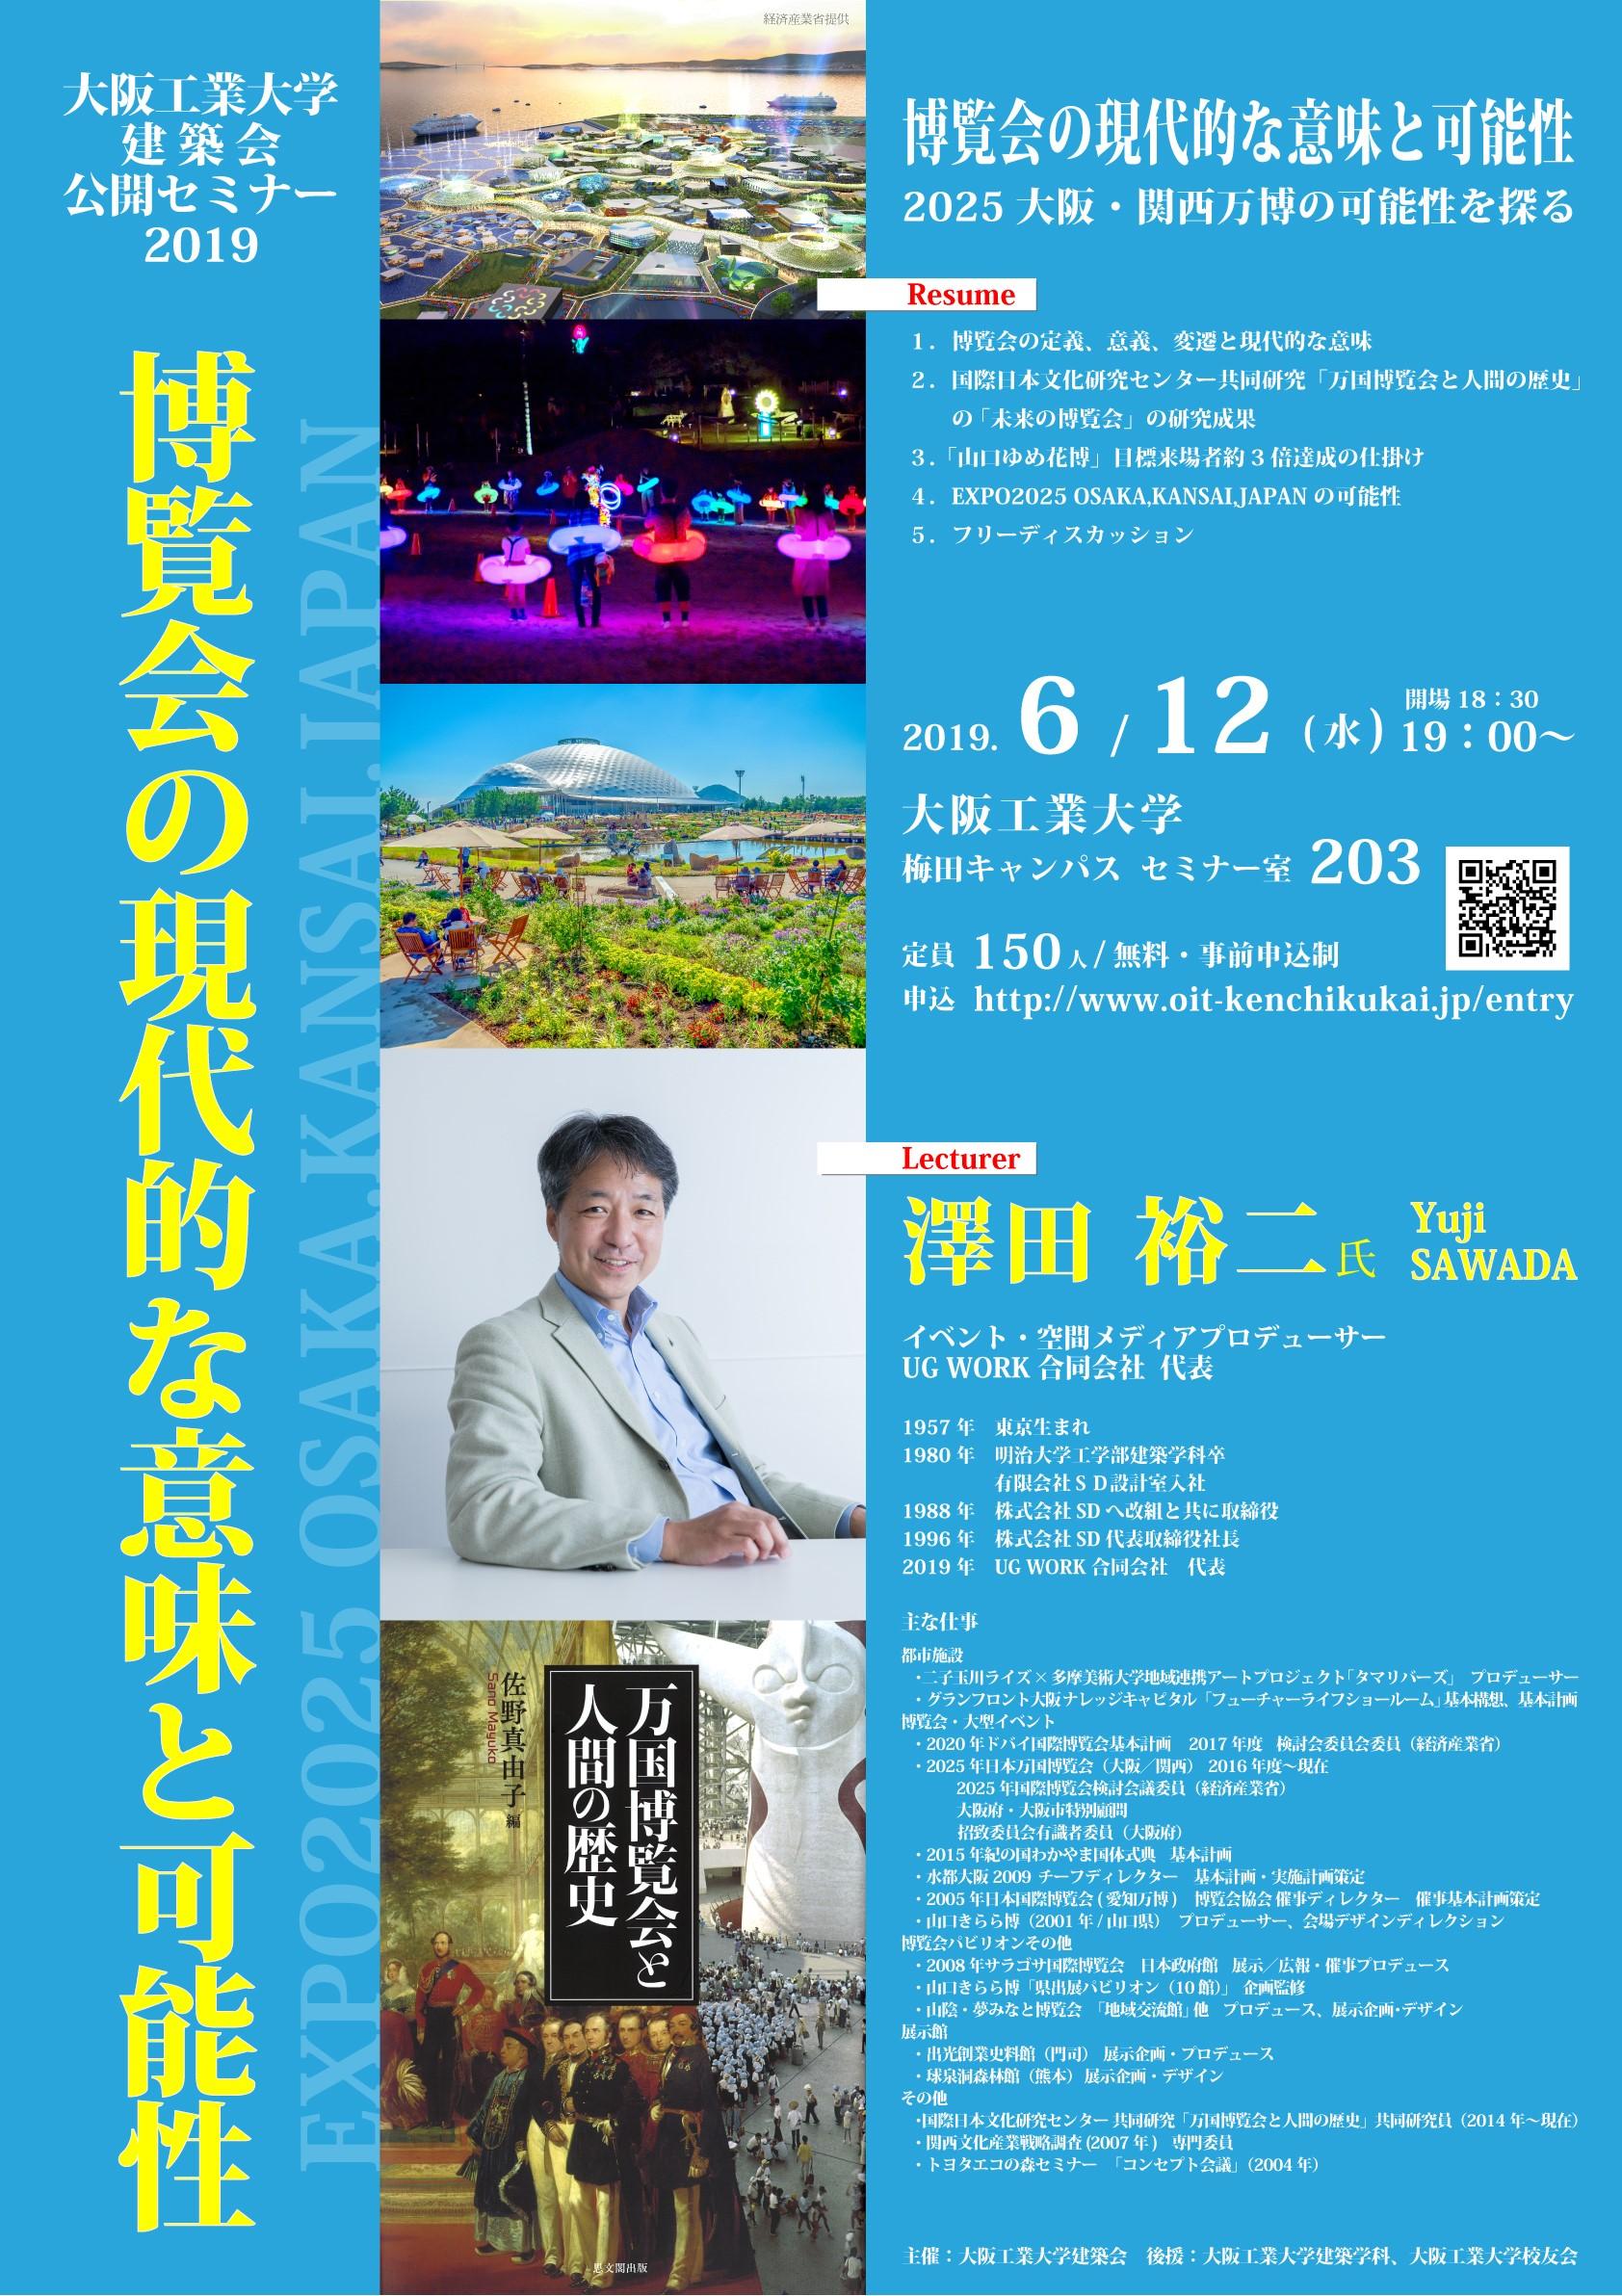 大阪工業大学建築会公開セミナー2019「博覧会の現代的な意味と可能性」を開催